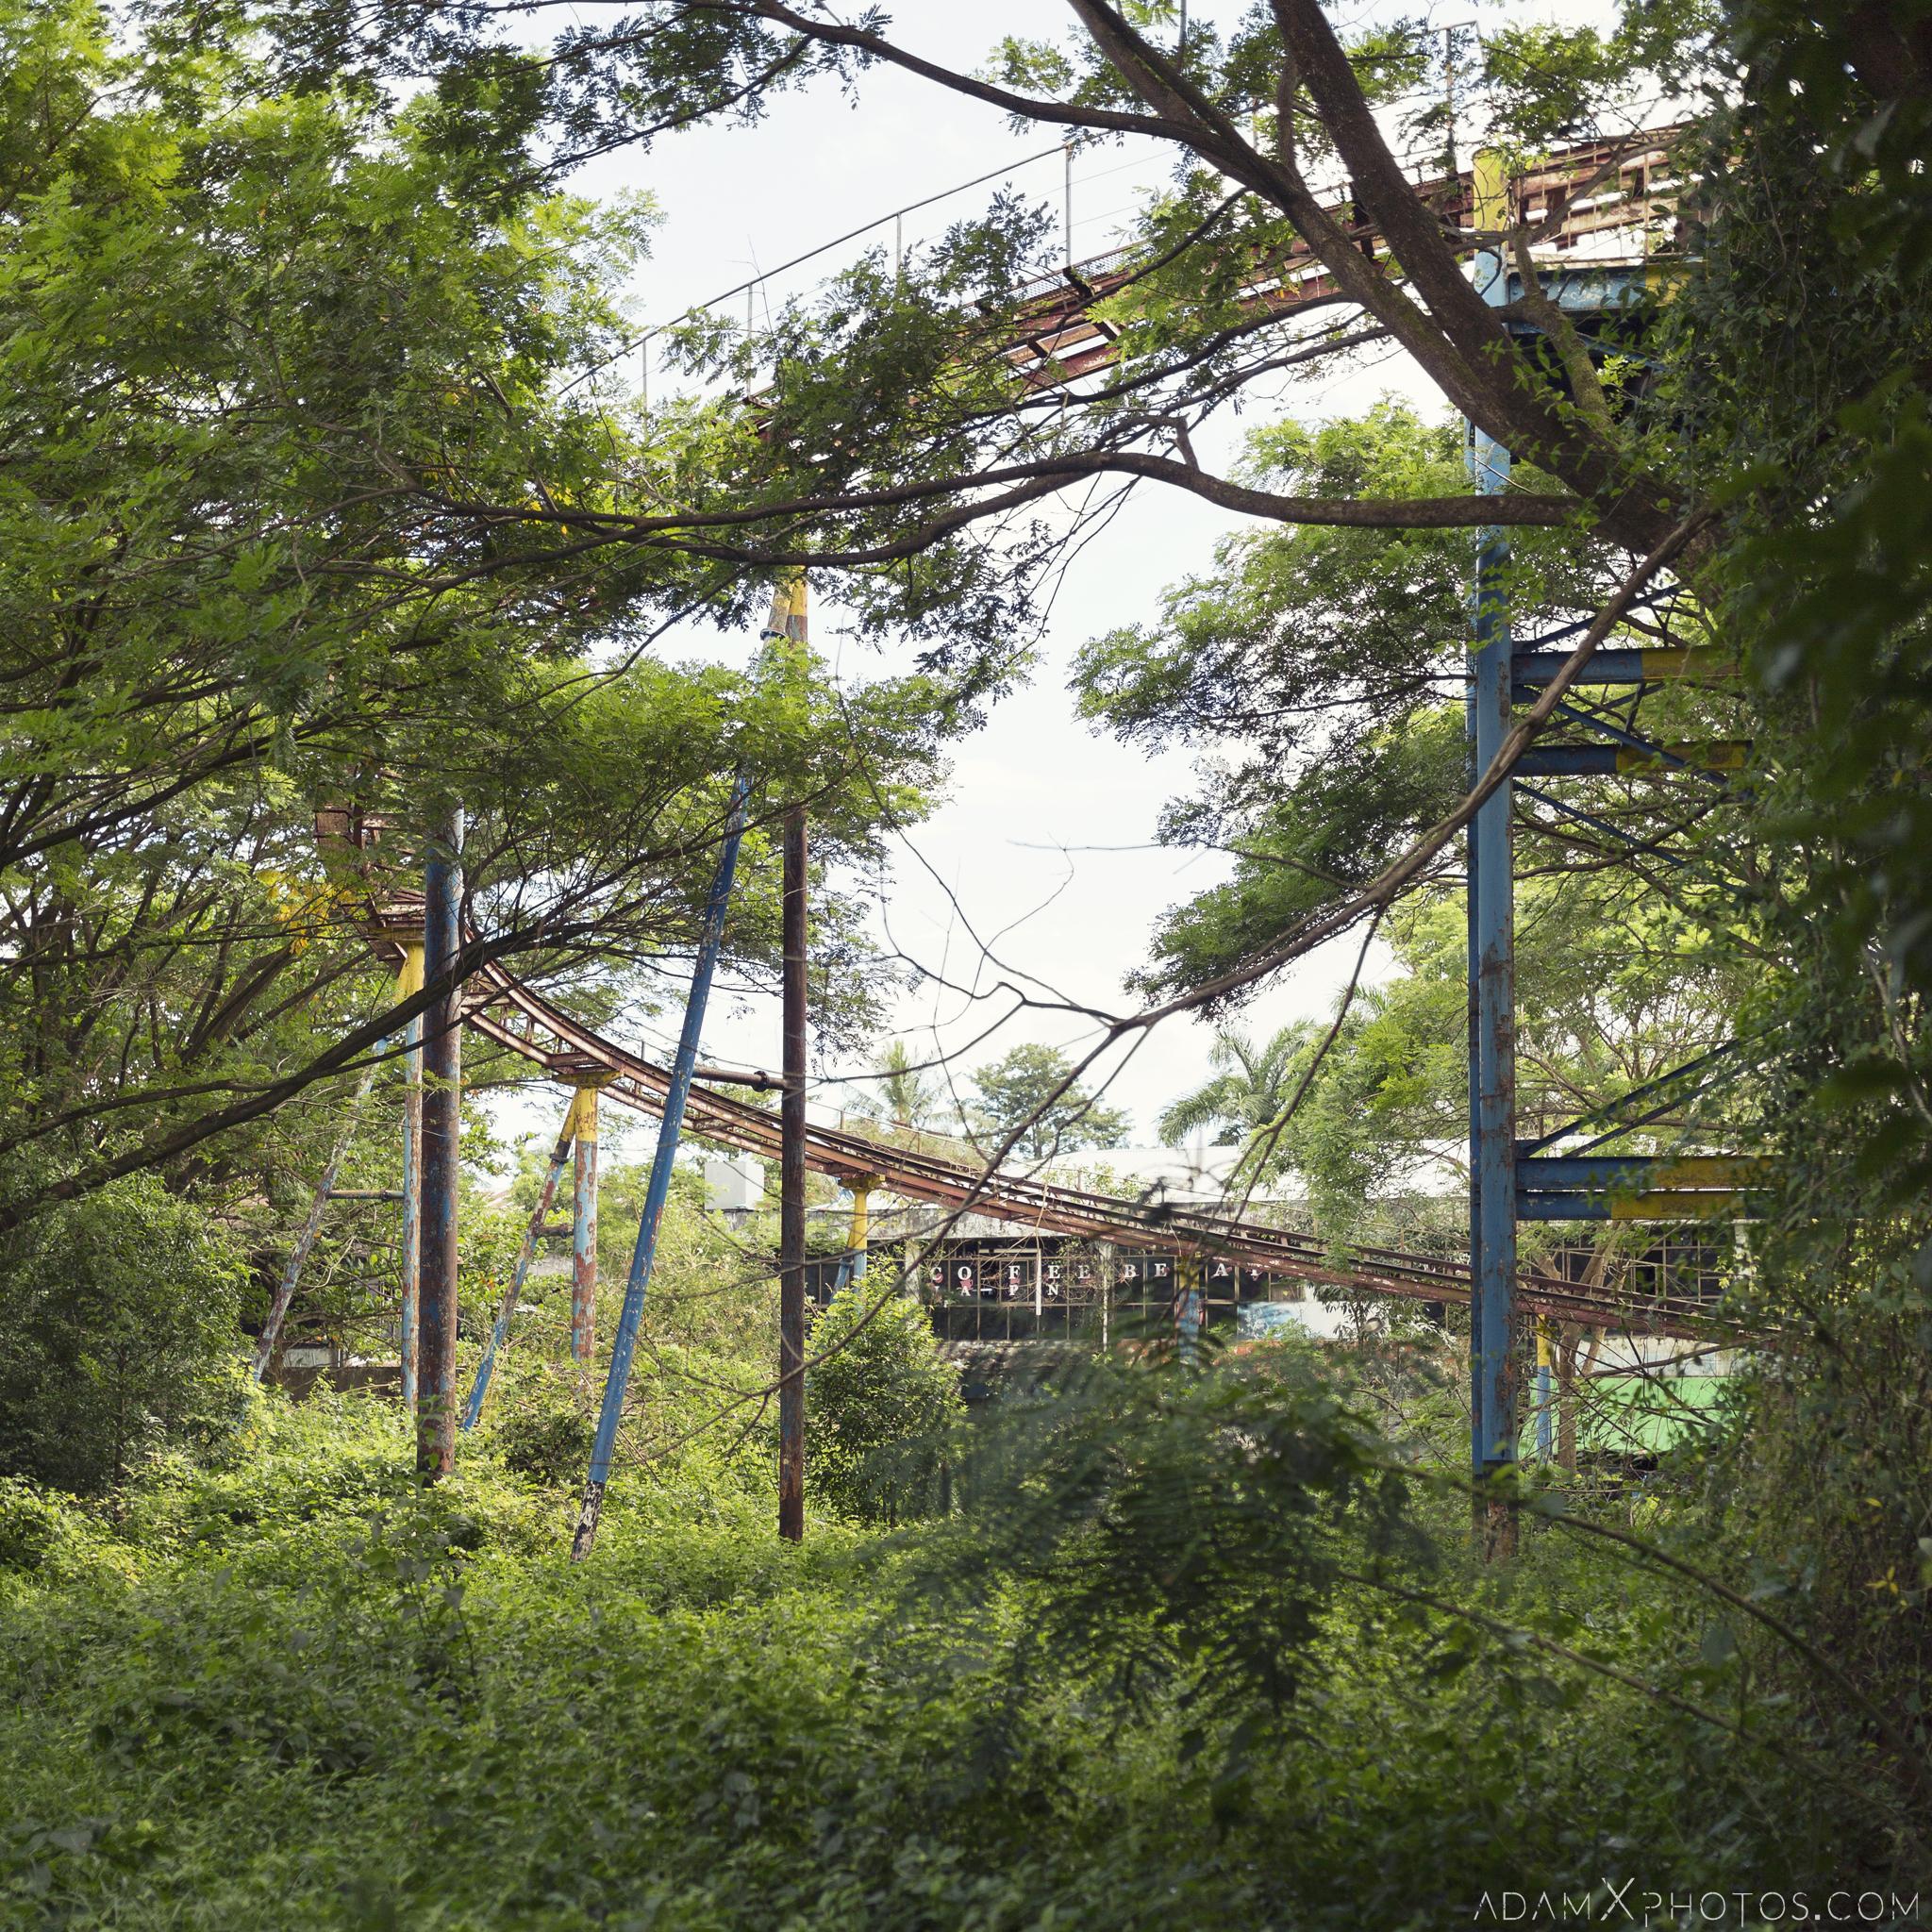 Jungle overgrown rollercoaster Happy World Theme Park Amusement Park Fairground Myanmar Burma Yangon Rangoon Urbex Adam X Urban Exploration Access 2016 Abandoned decay lost forgotten derelict location creepy haunting eerie